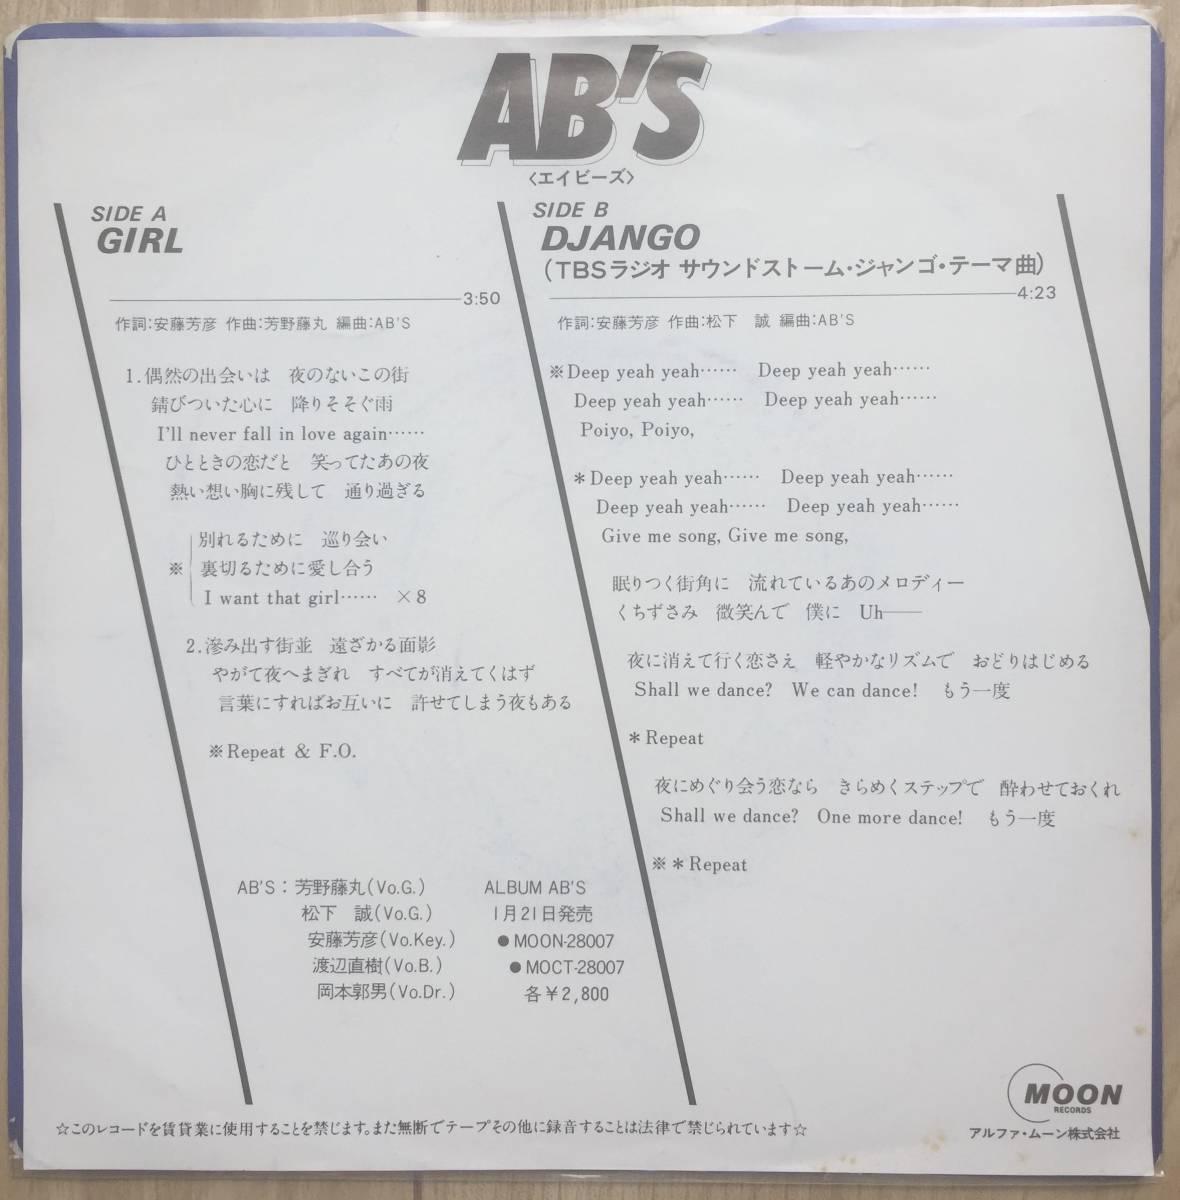 AB'S★EP「GIRL / DJANGO」/芳野藤丸/松下誠/Light Mellow/和モノ_画像2